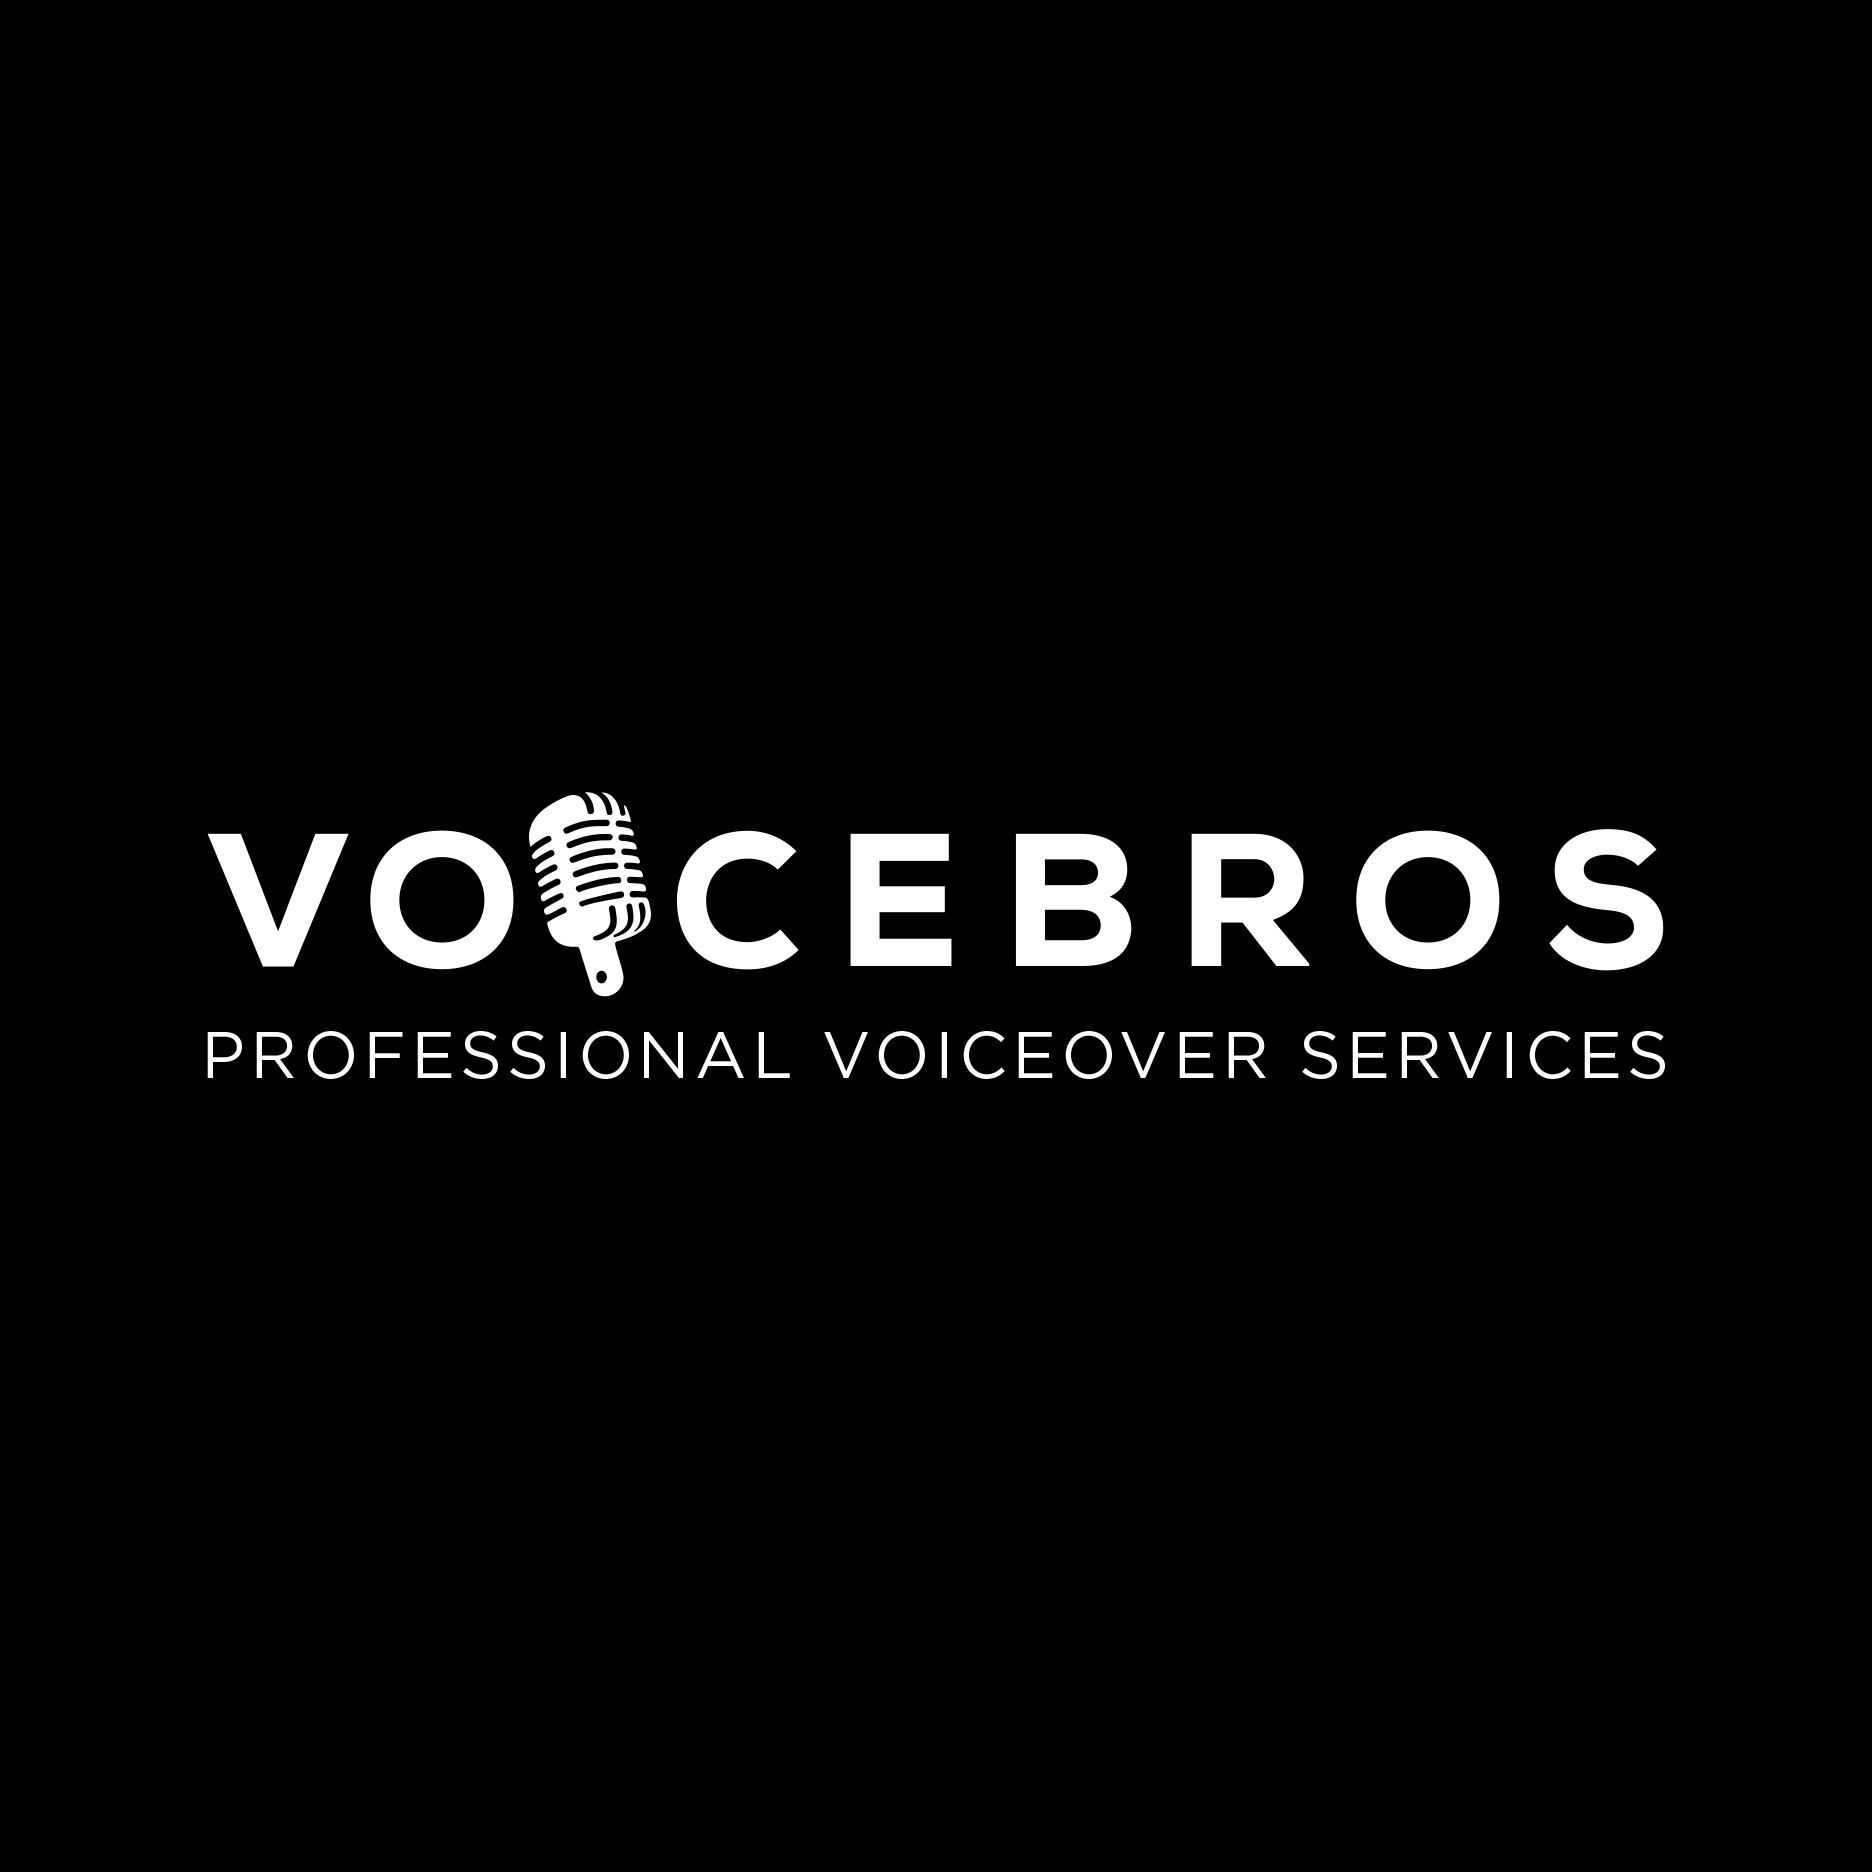 Nicolas Kristoffersen is a voice over actor